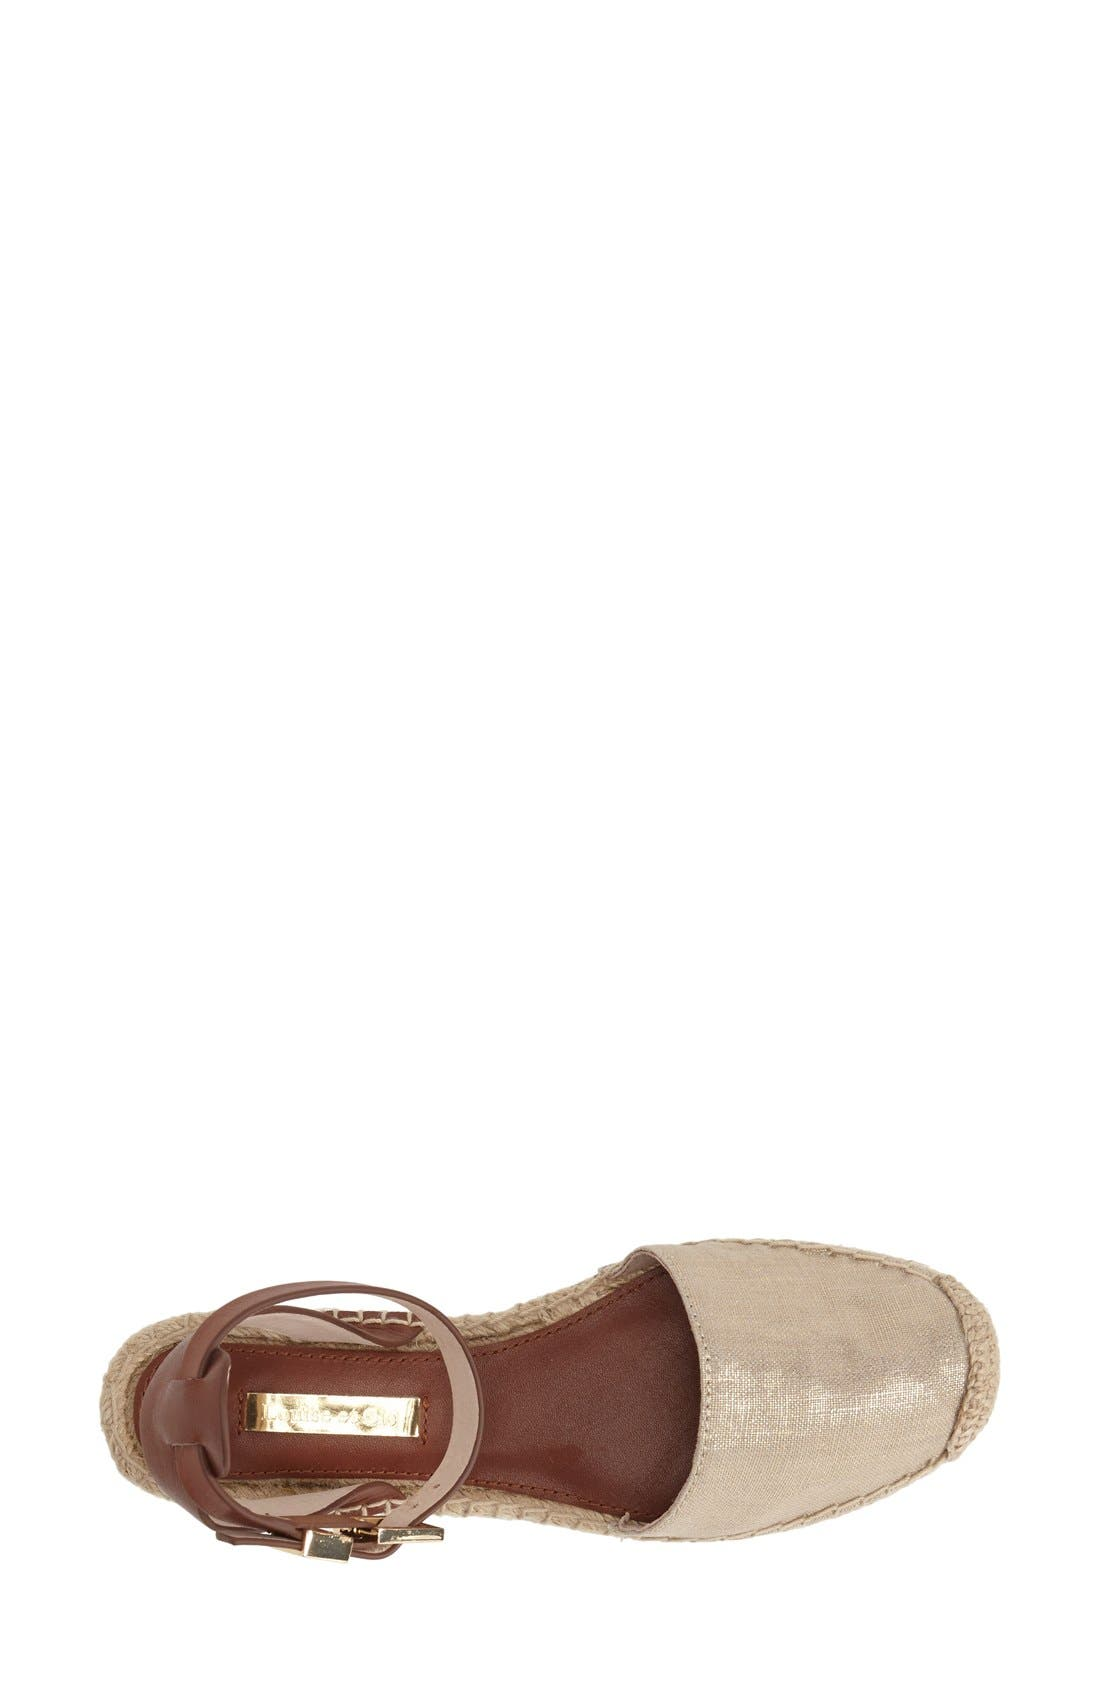 Alternate Image 3  - Louise et Cie 'Frida' Ankle Strap Espadrille Flat (Women)